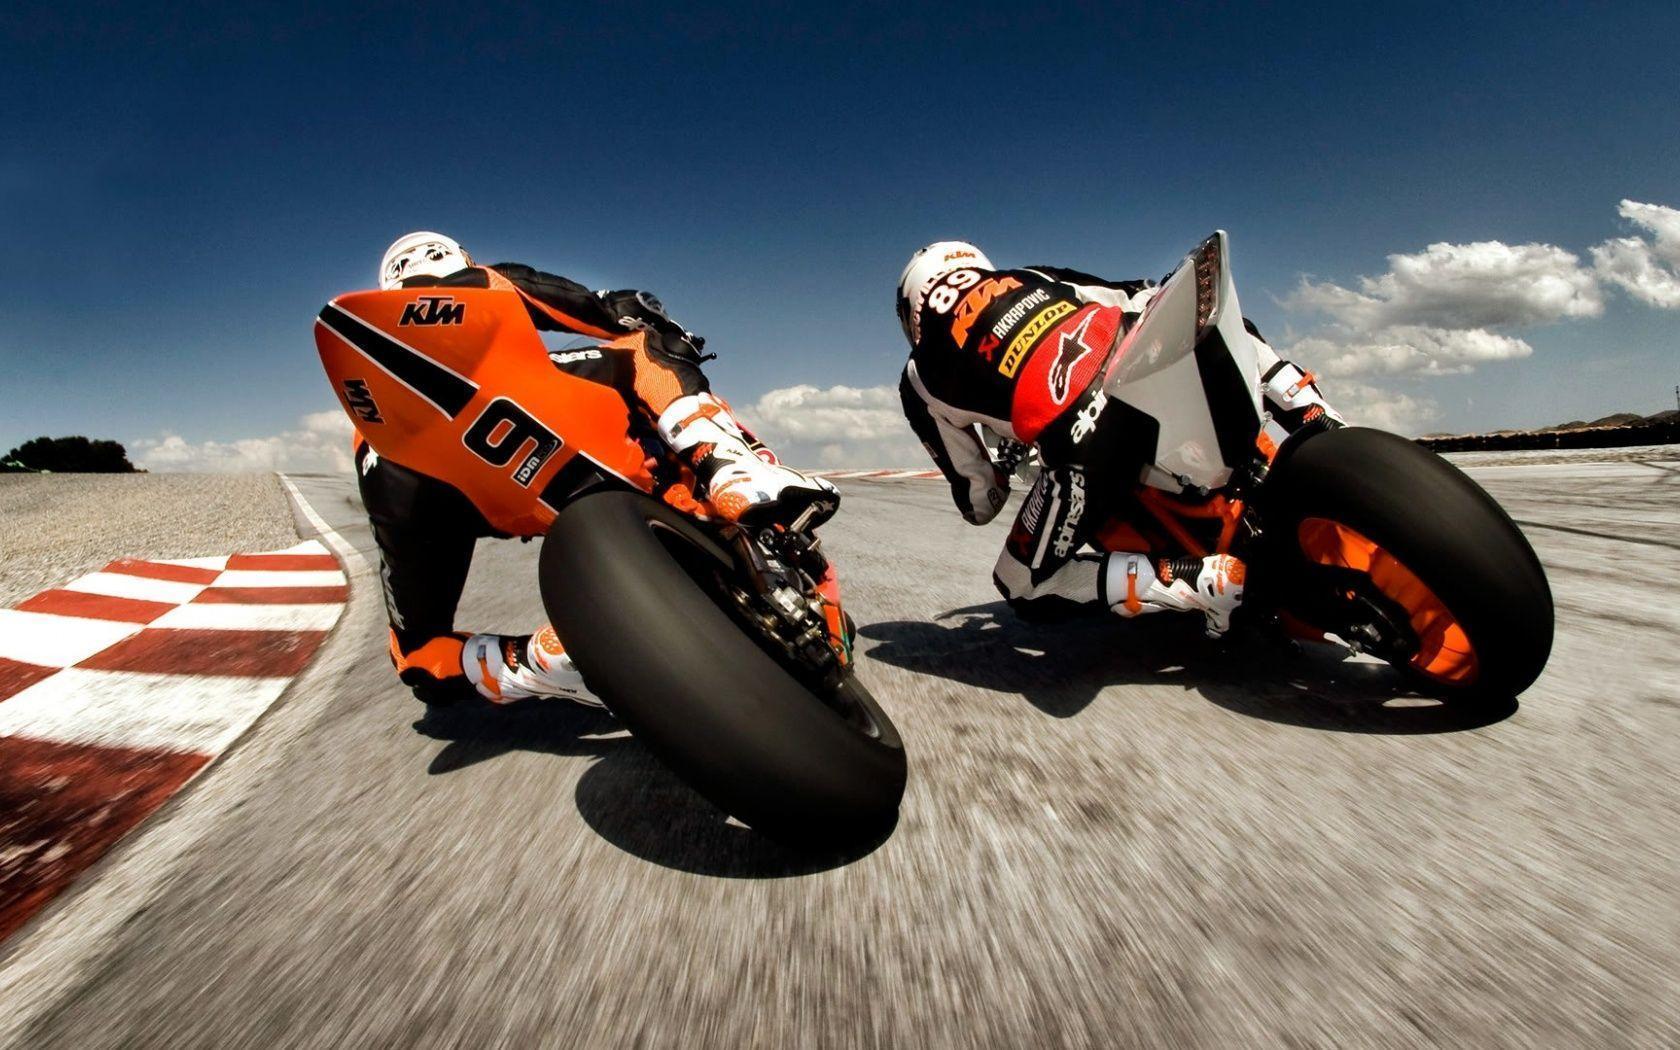 Ktm Bikes Images | KTM Bikes Backgrounds and Images (47 ...